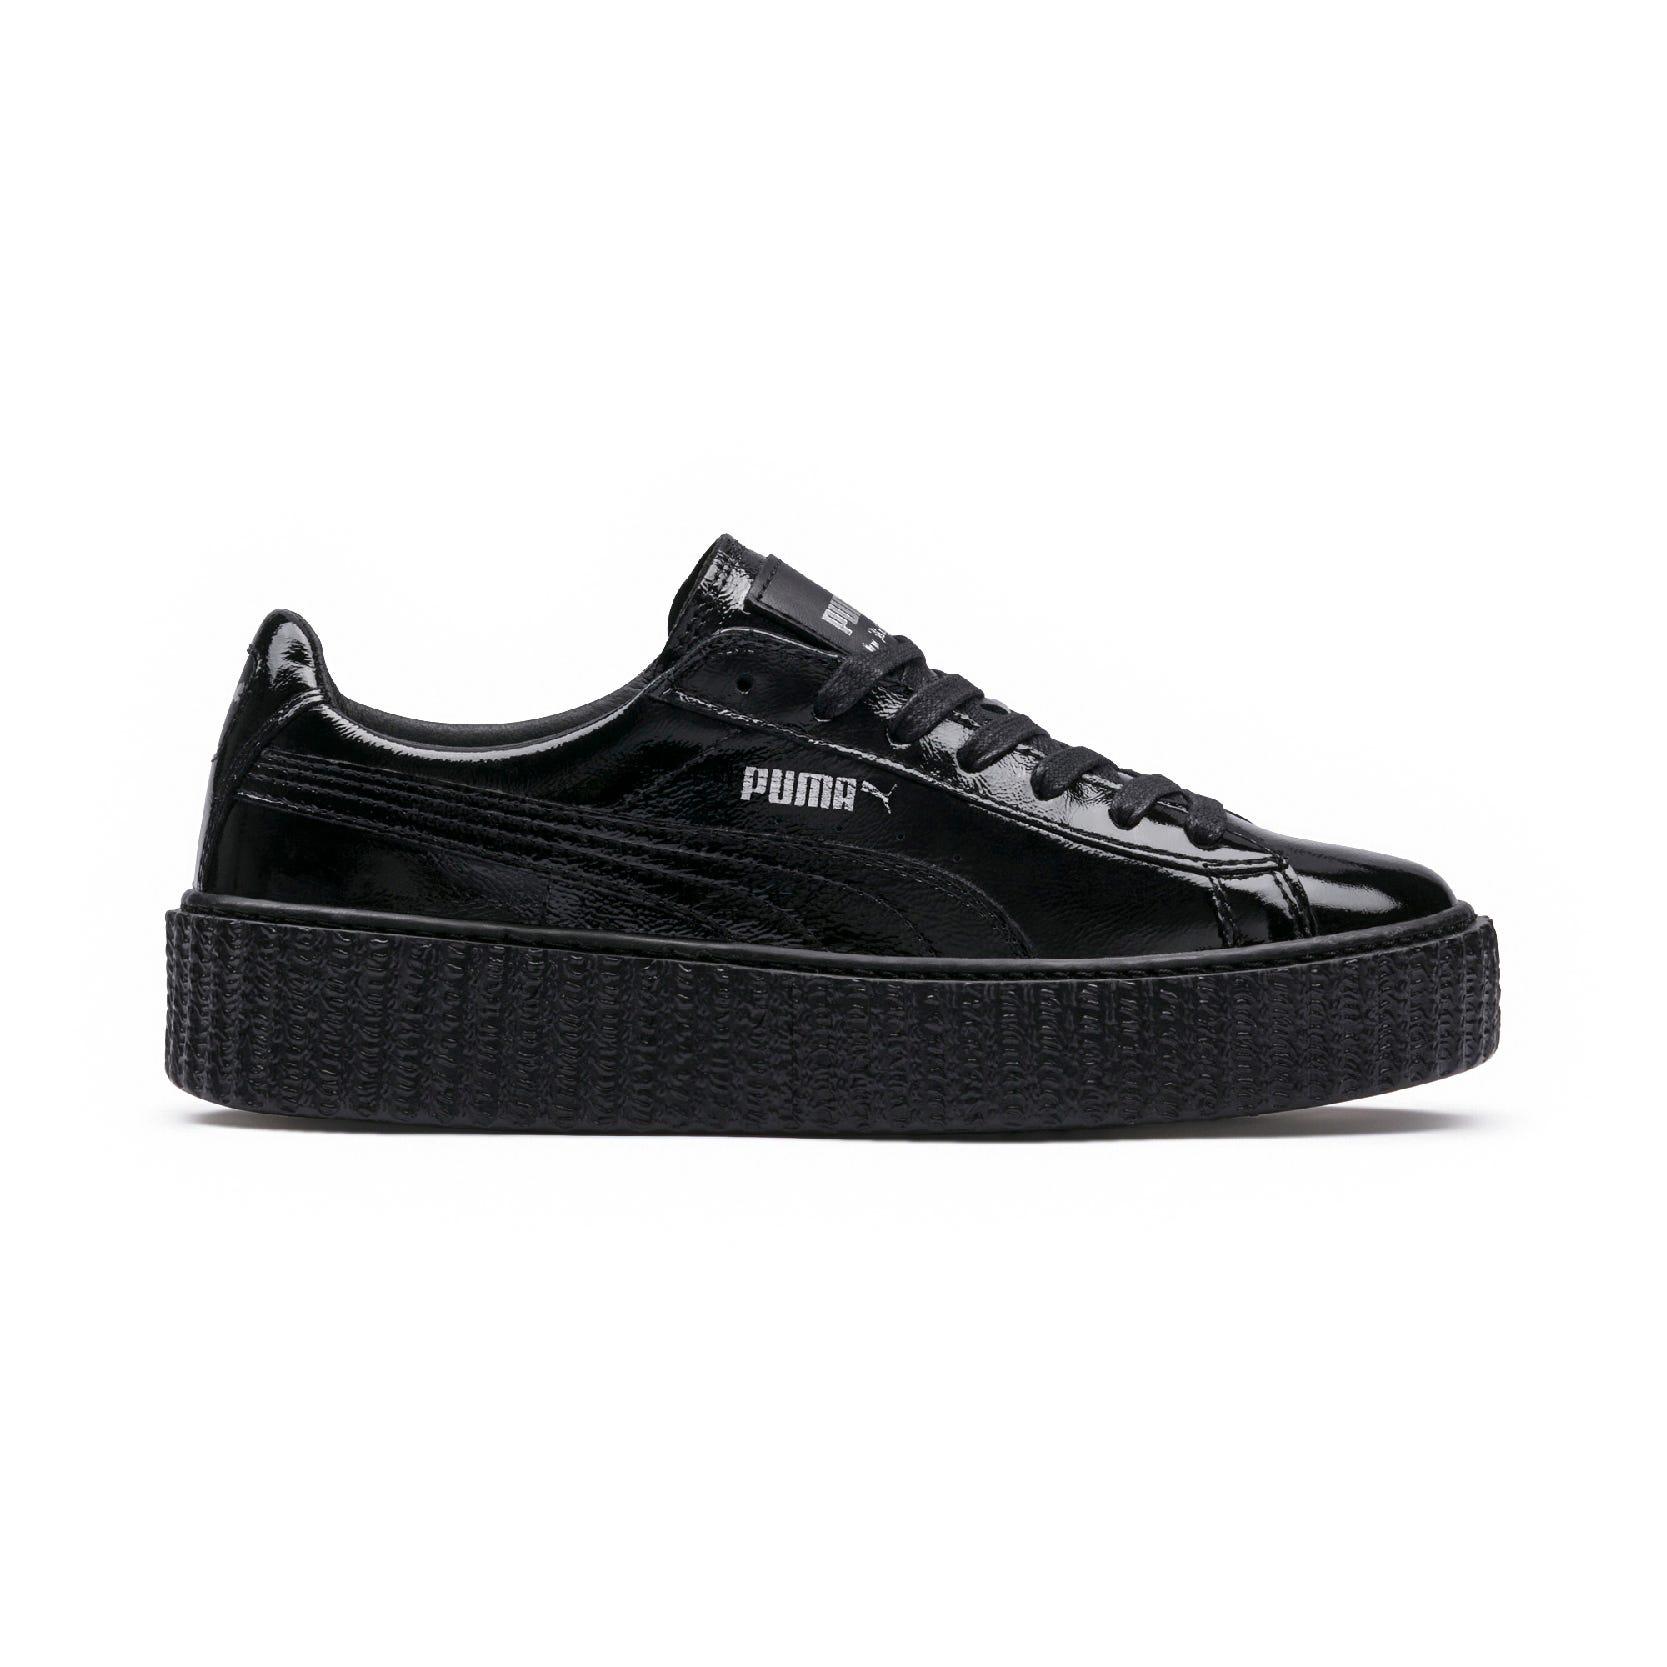 cab02c9484d2 Rihanna Fenty Puma Creeper Sneaker New Black White Drop